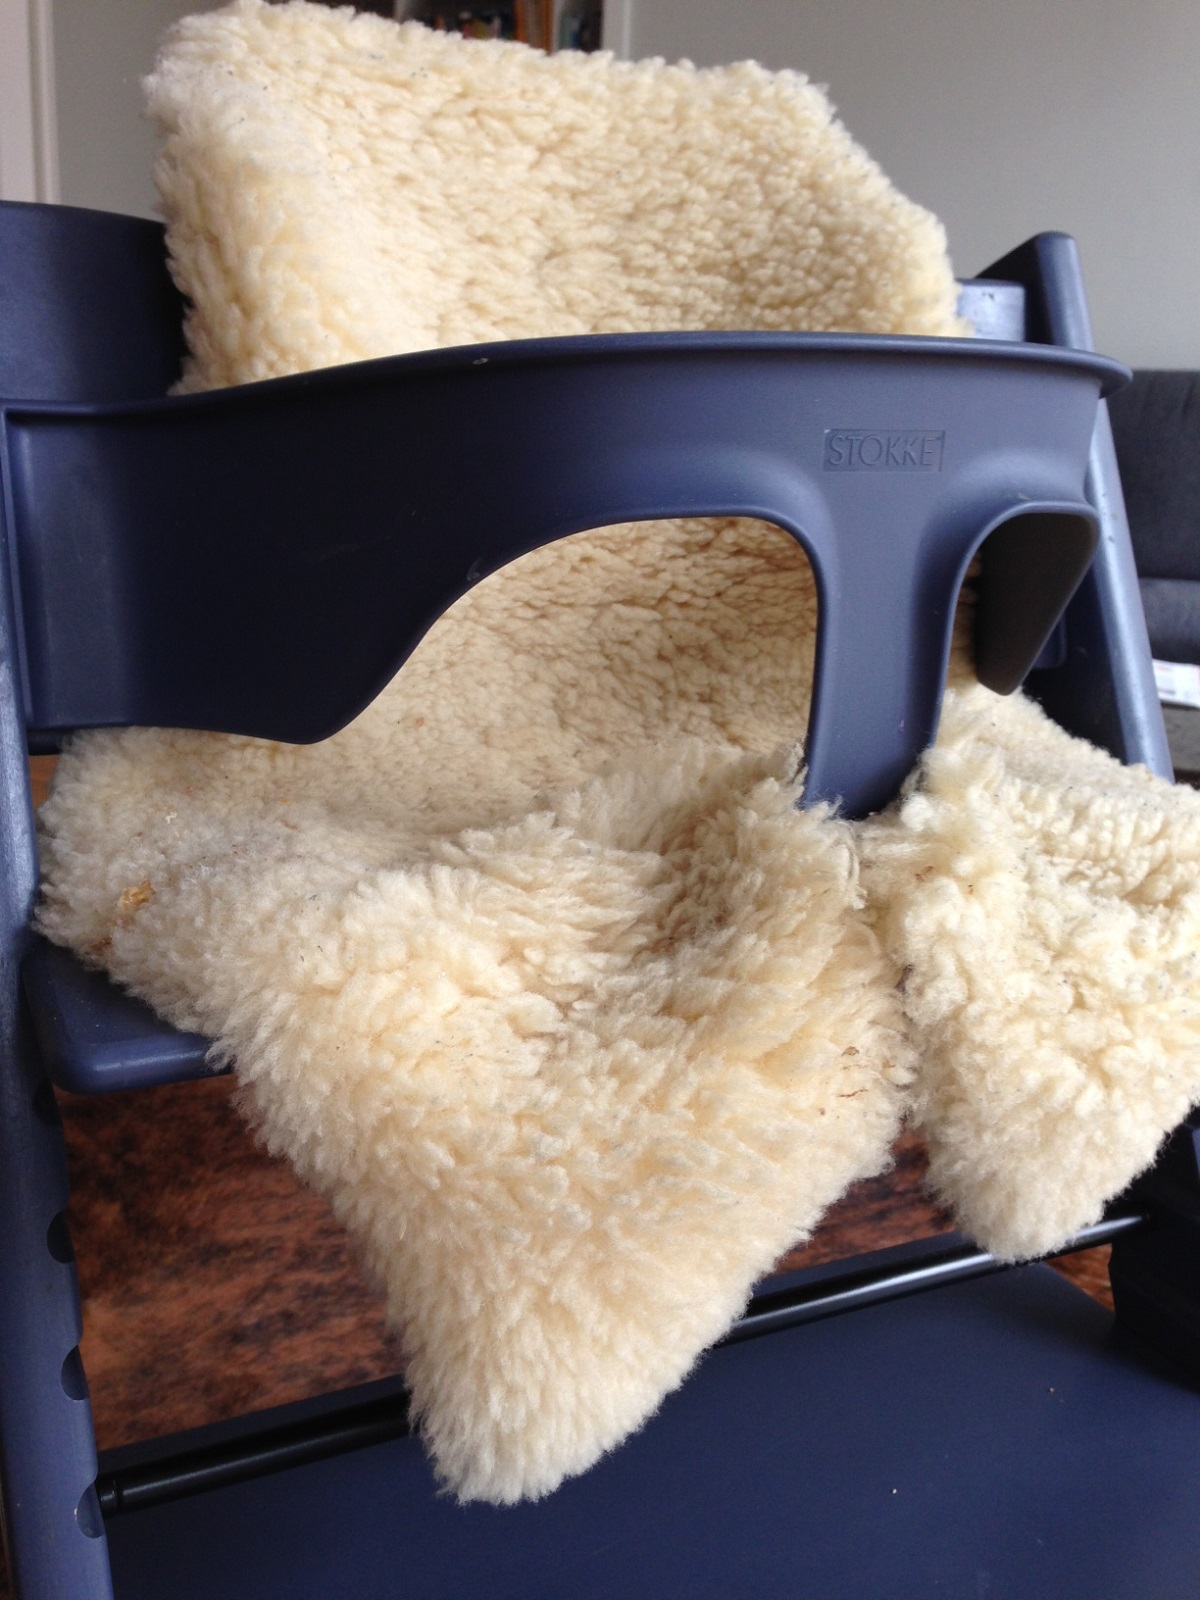 stokke tripp trapp versteckte kosten aber trotzdem gut. Black Bedroom Furniture Sets. Home Design Ideas